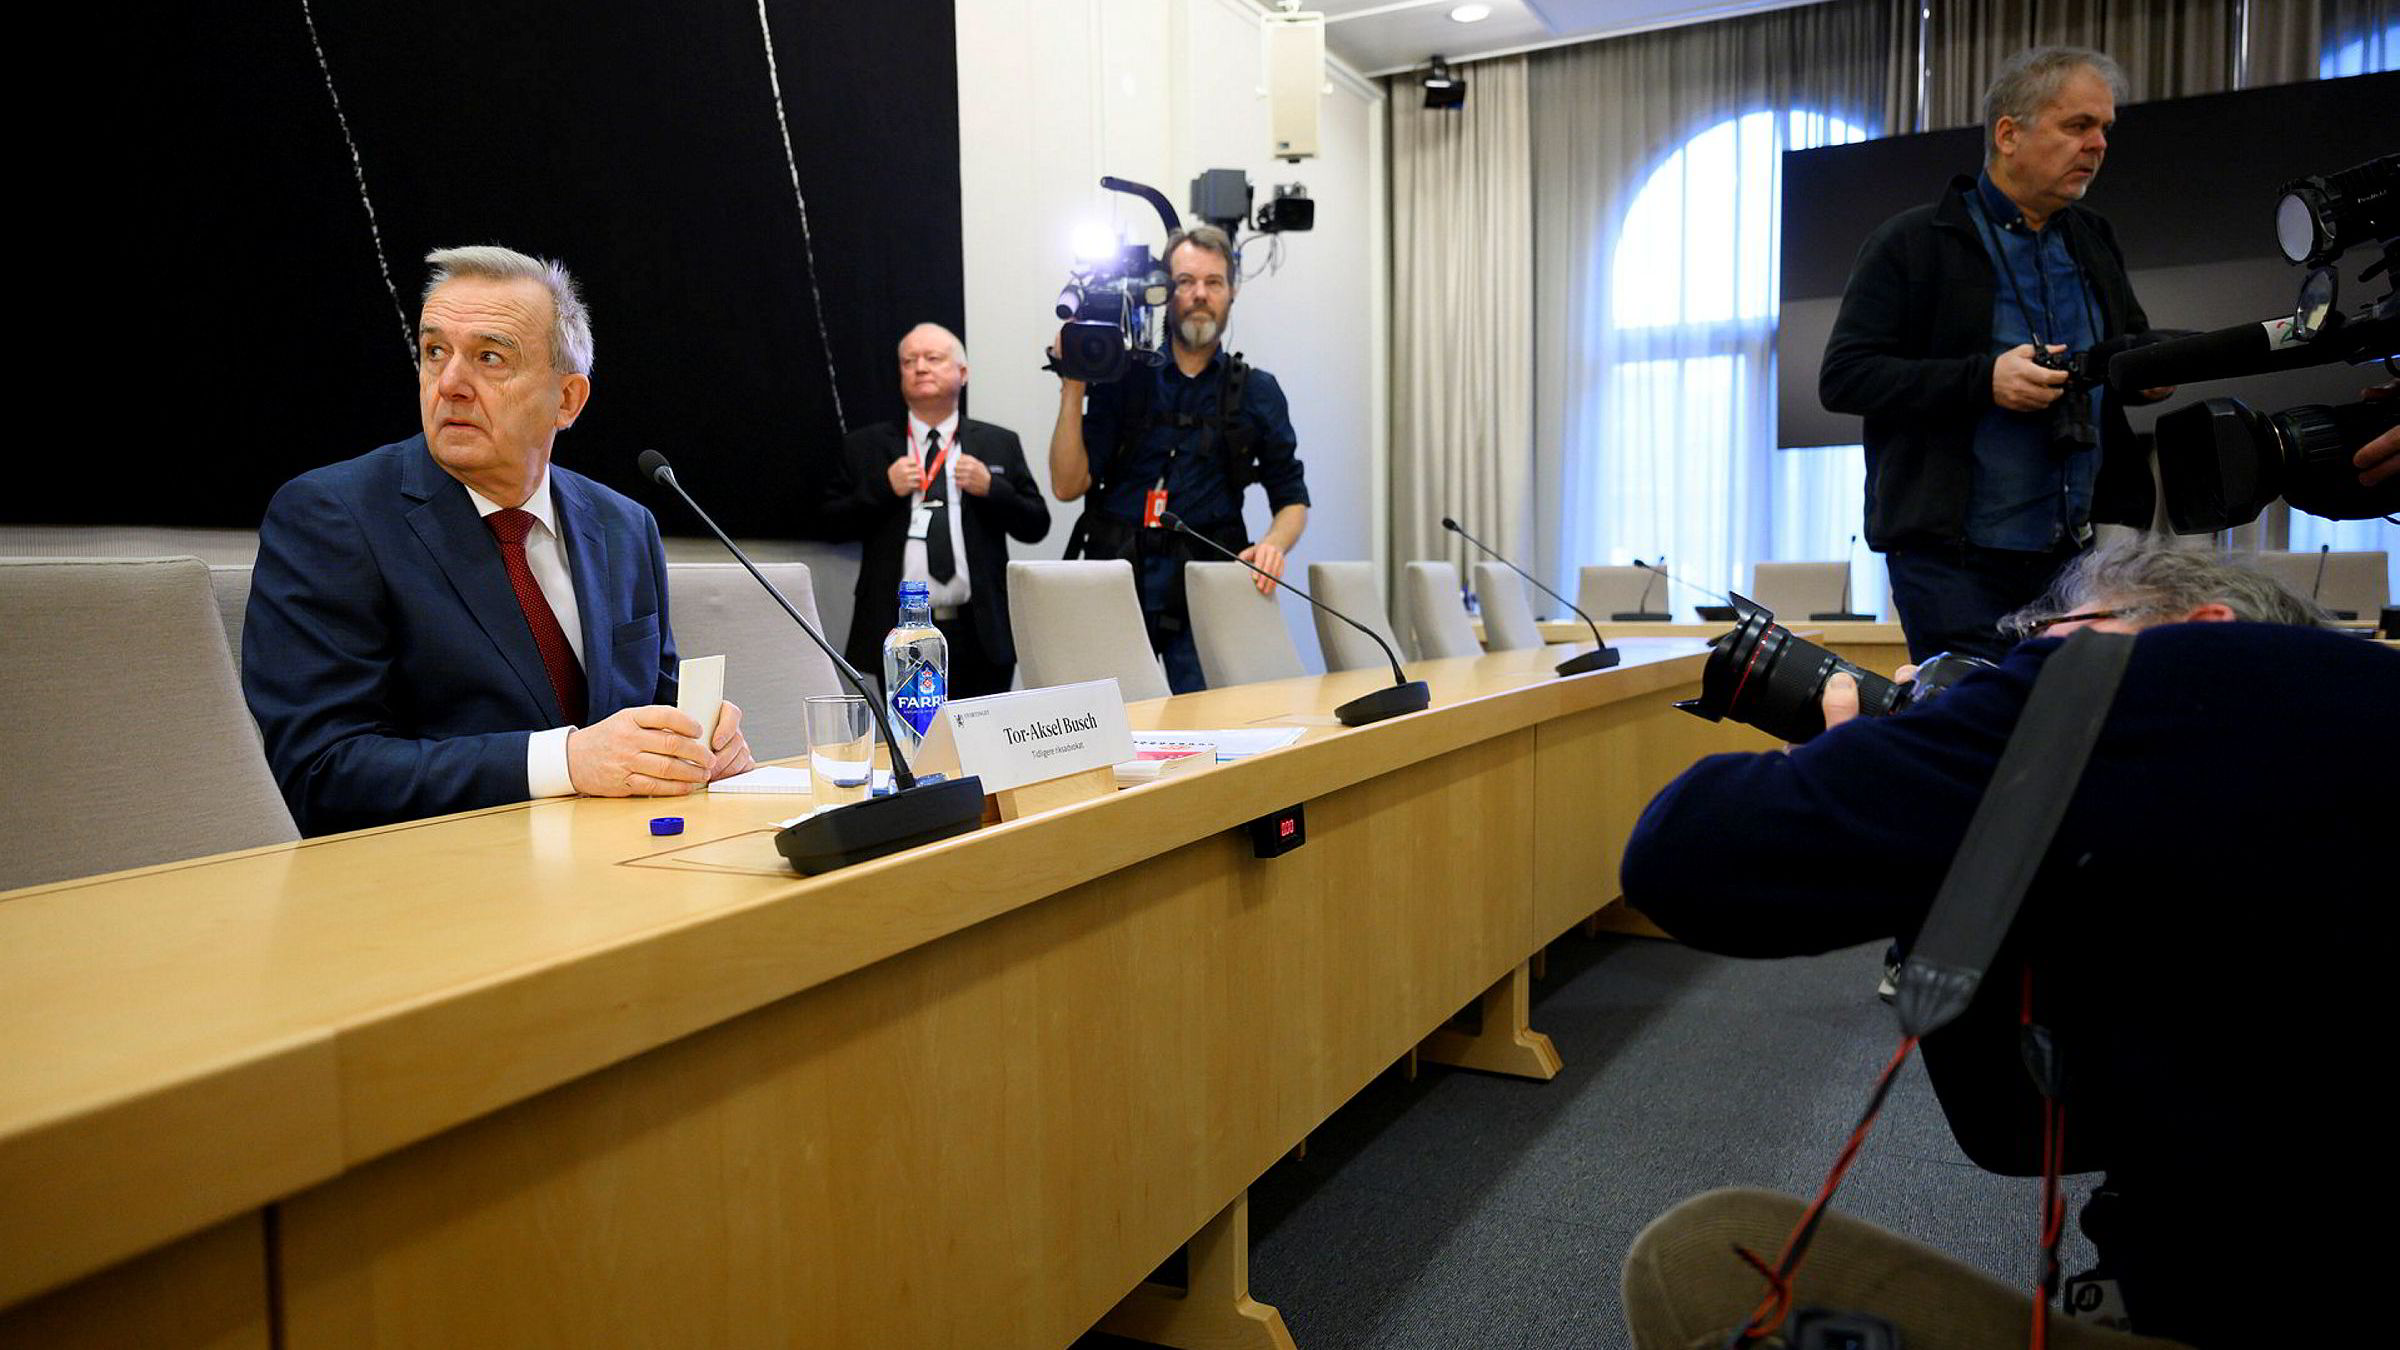 Tidligere riksadvokat Tor-Aksel Busch startet sin orientering i den åpne høringen om NAV-skandalen med å beklage.